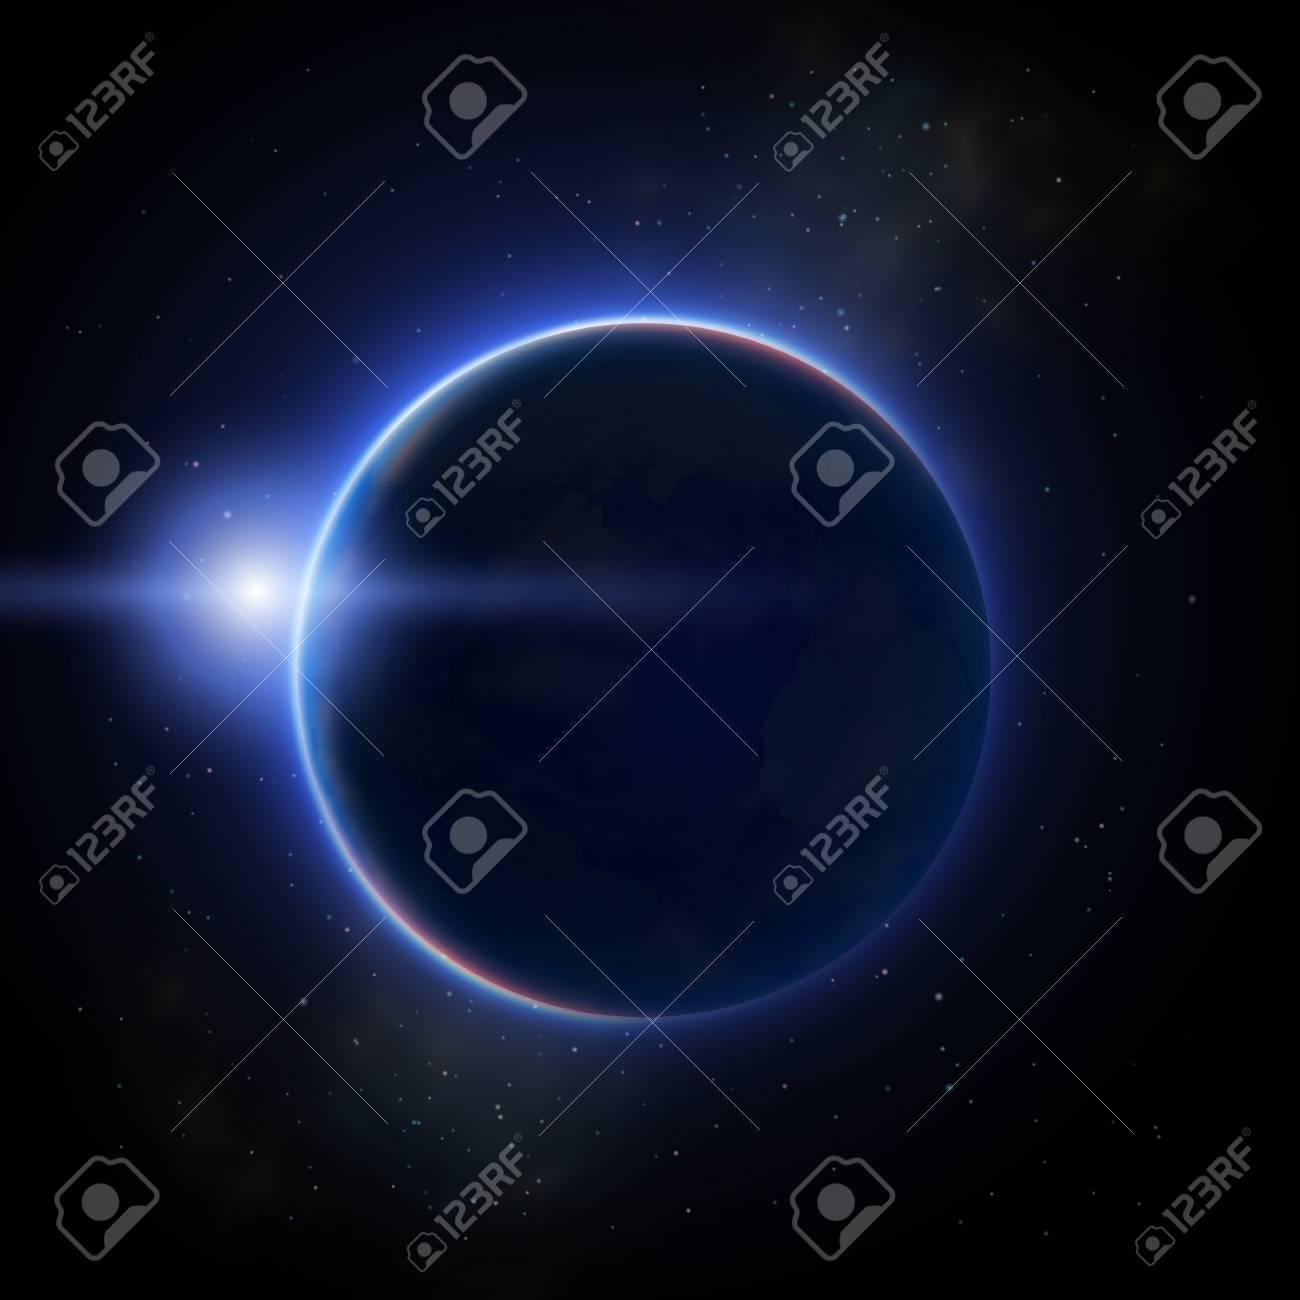 Moon Eclipse Illustration vector - 89691364